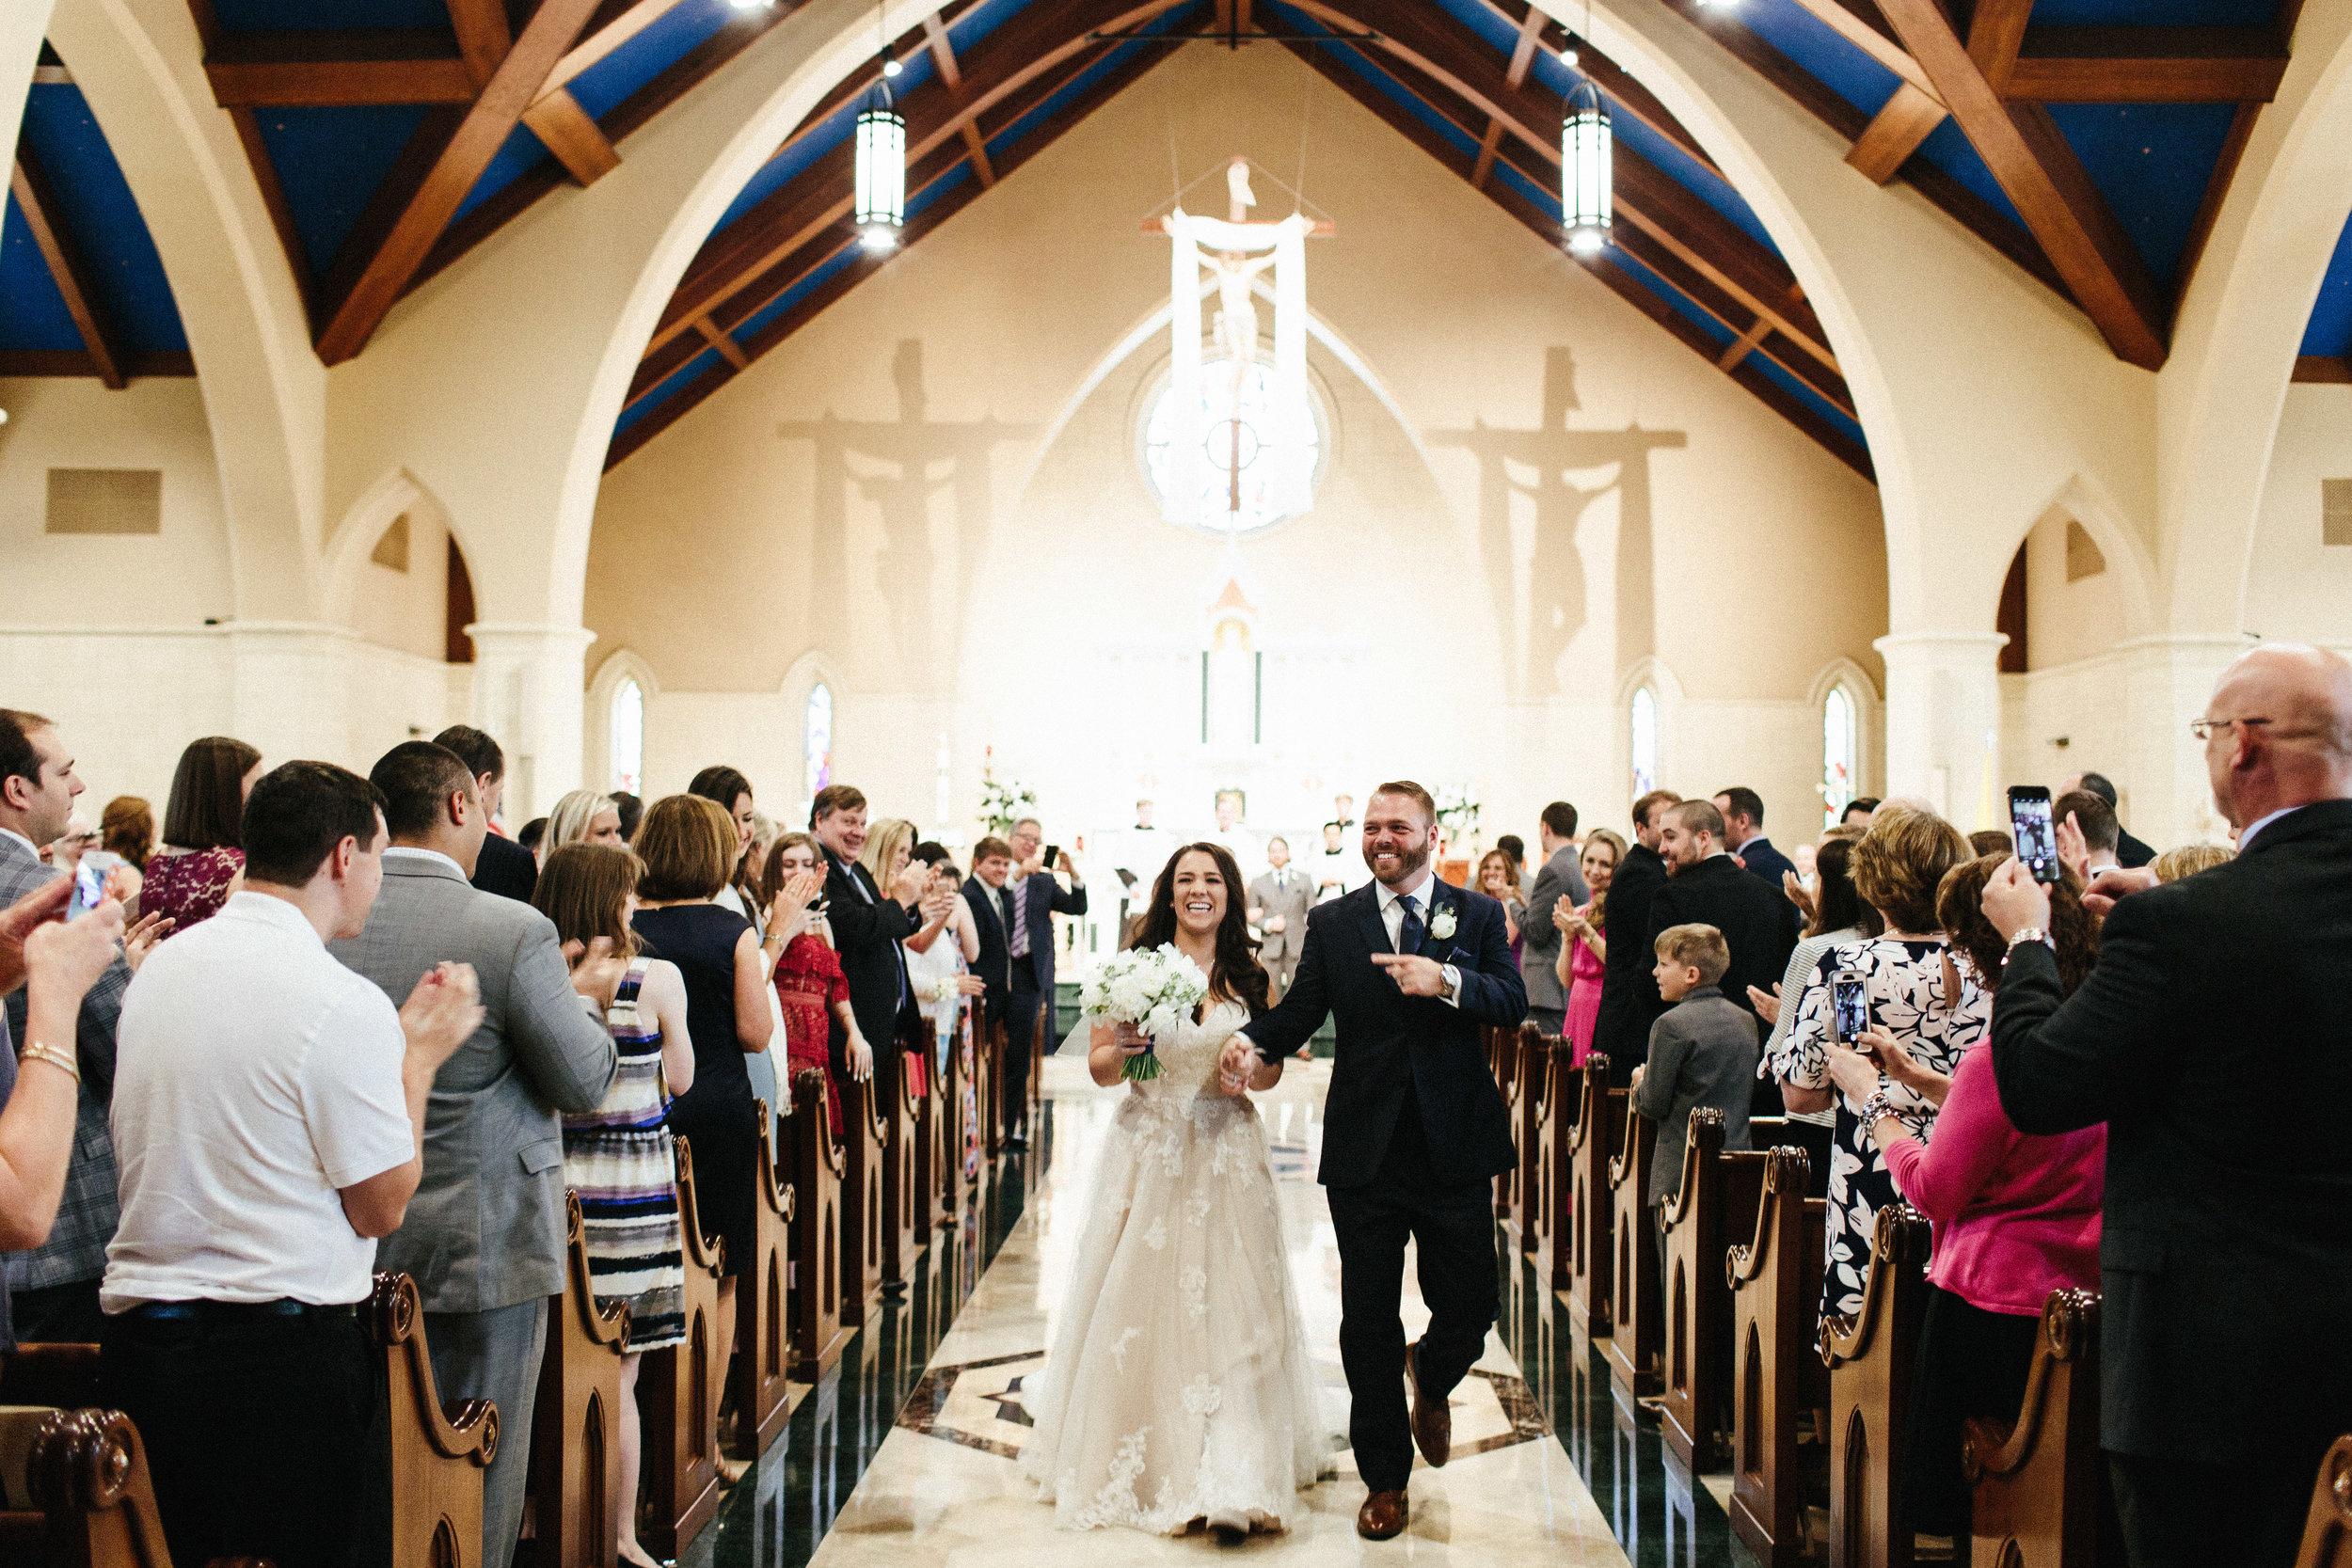 roswell_st_peter_chanel_catholic_avalon_hotel_alpharetta_wedding-1552.jpg